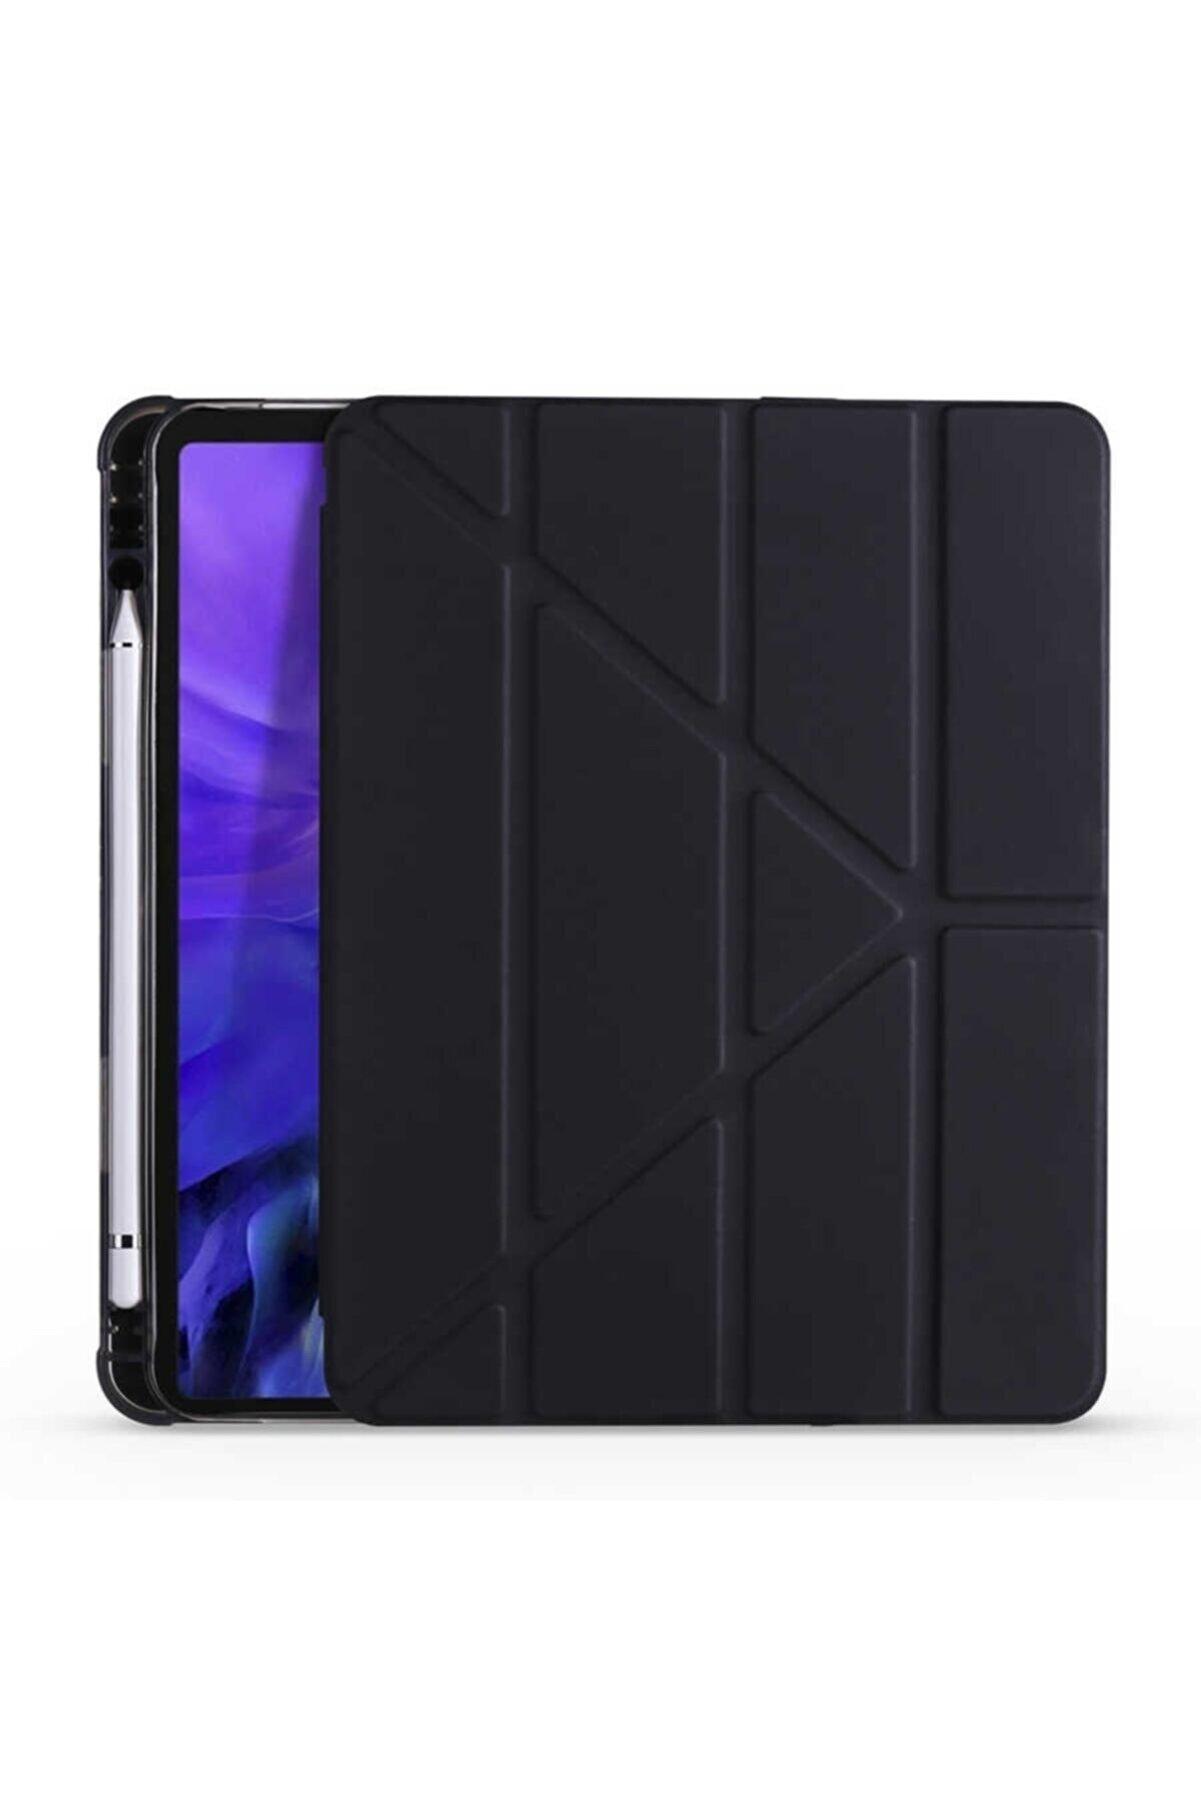 Samsung Galaxy Tab S6 Lite P610 Kılıf Tri Folding Smart Cover Standlı Kalemlikli Kapak Siyah